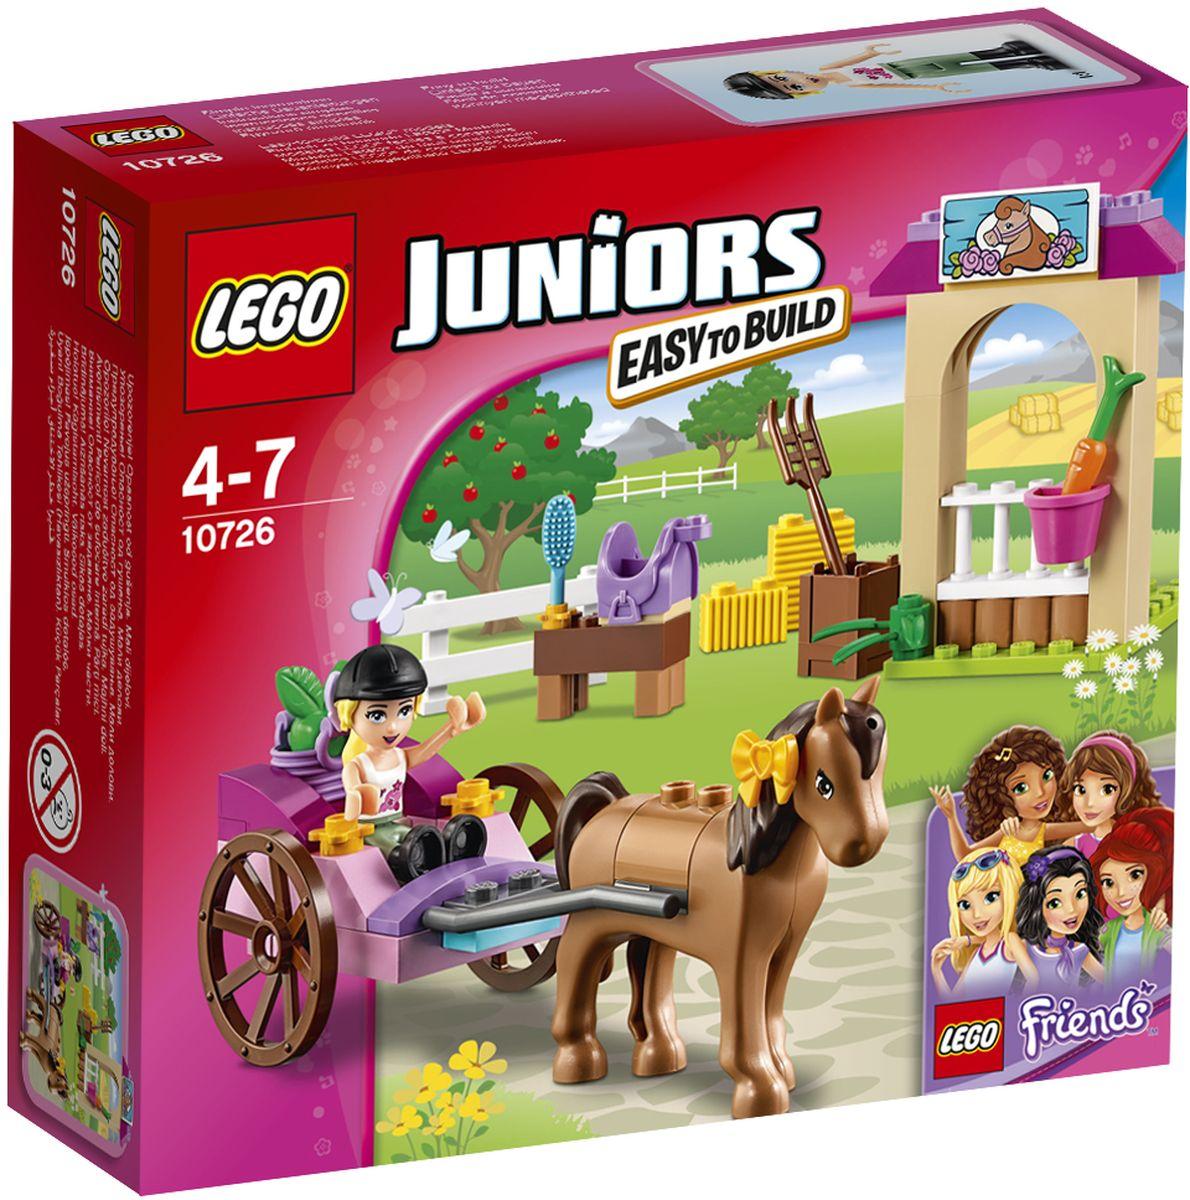 LEGO Juniors Конструктор Карета Стефани 10726 lego juniors 10726 конструктор лего джуниорс карета стефани